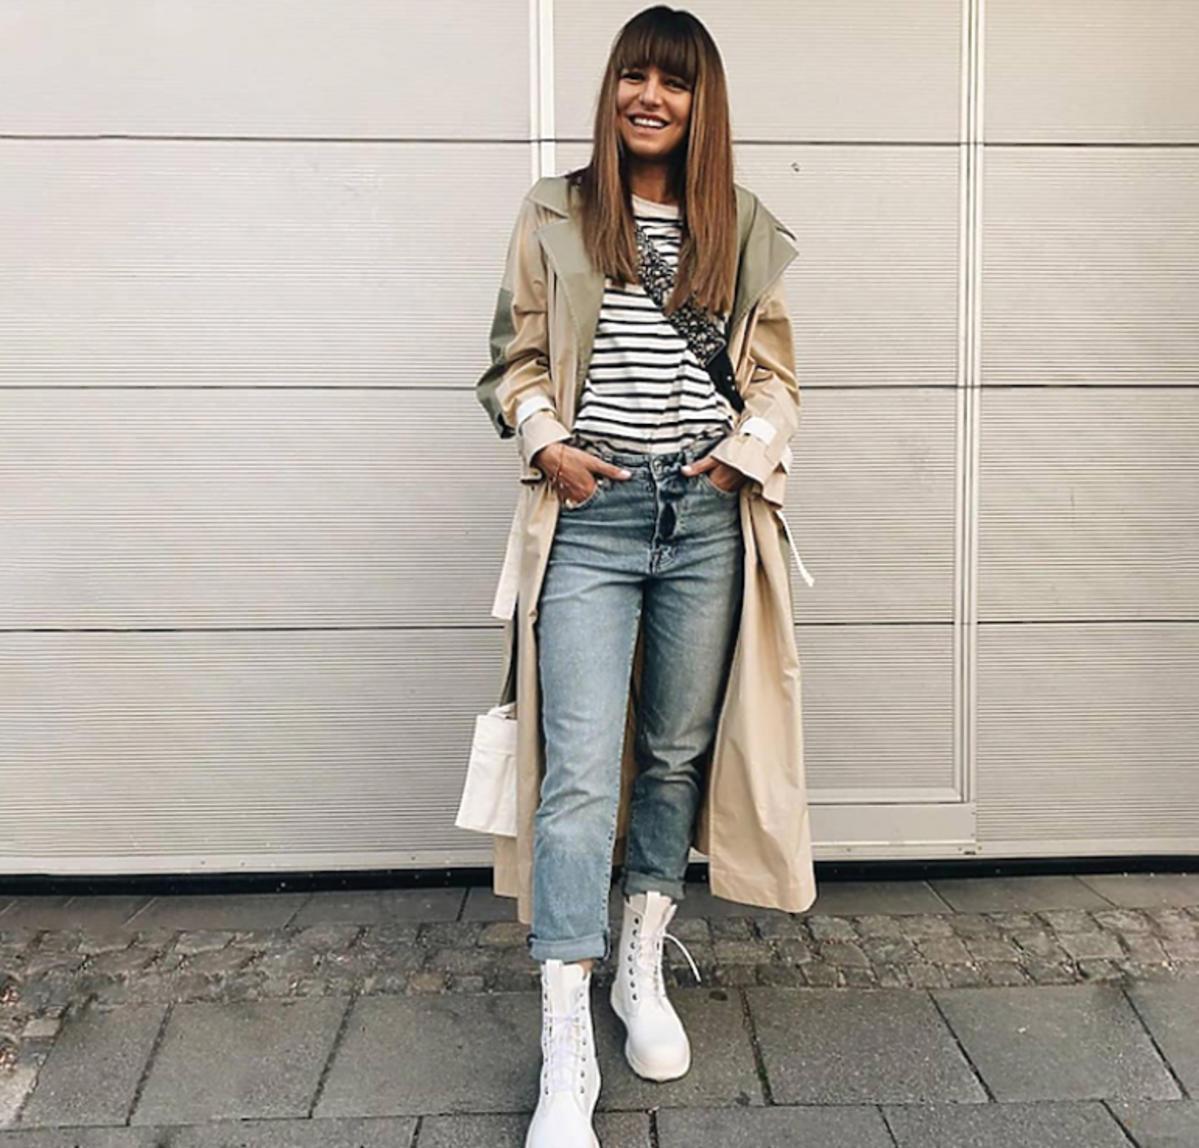 Anna Lewandowska w białych butach